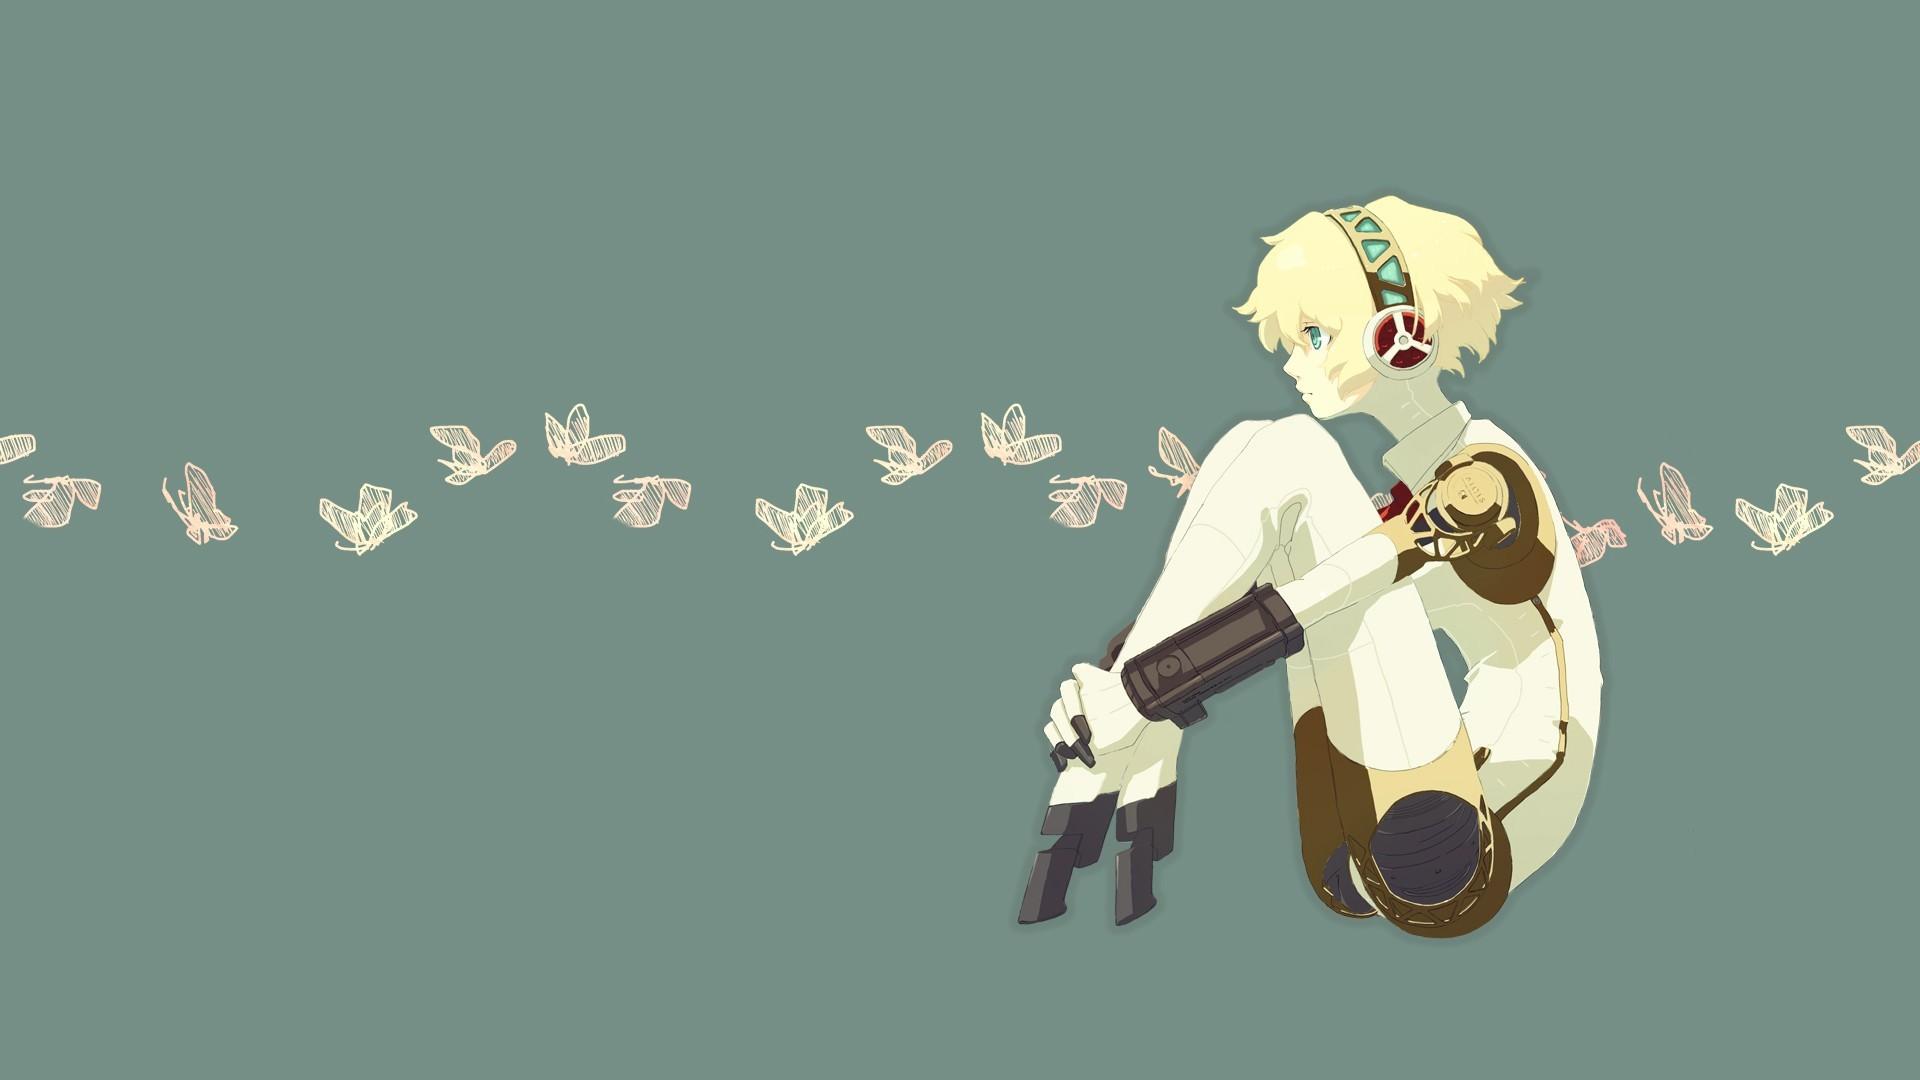 Persona 3 Aigis: